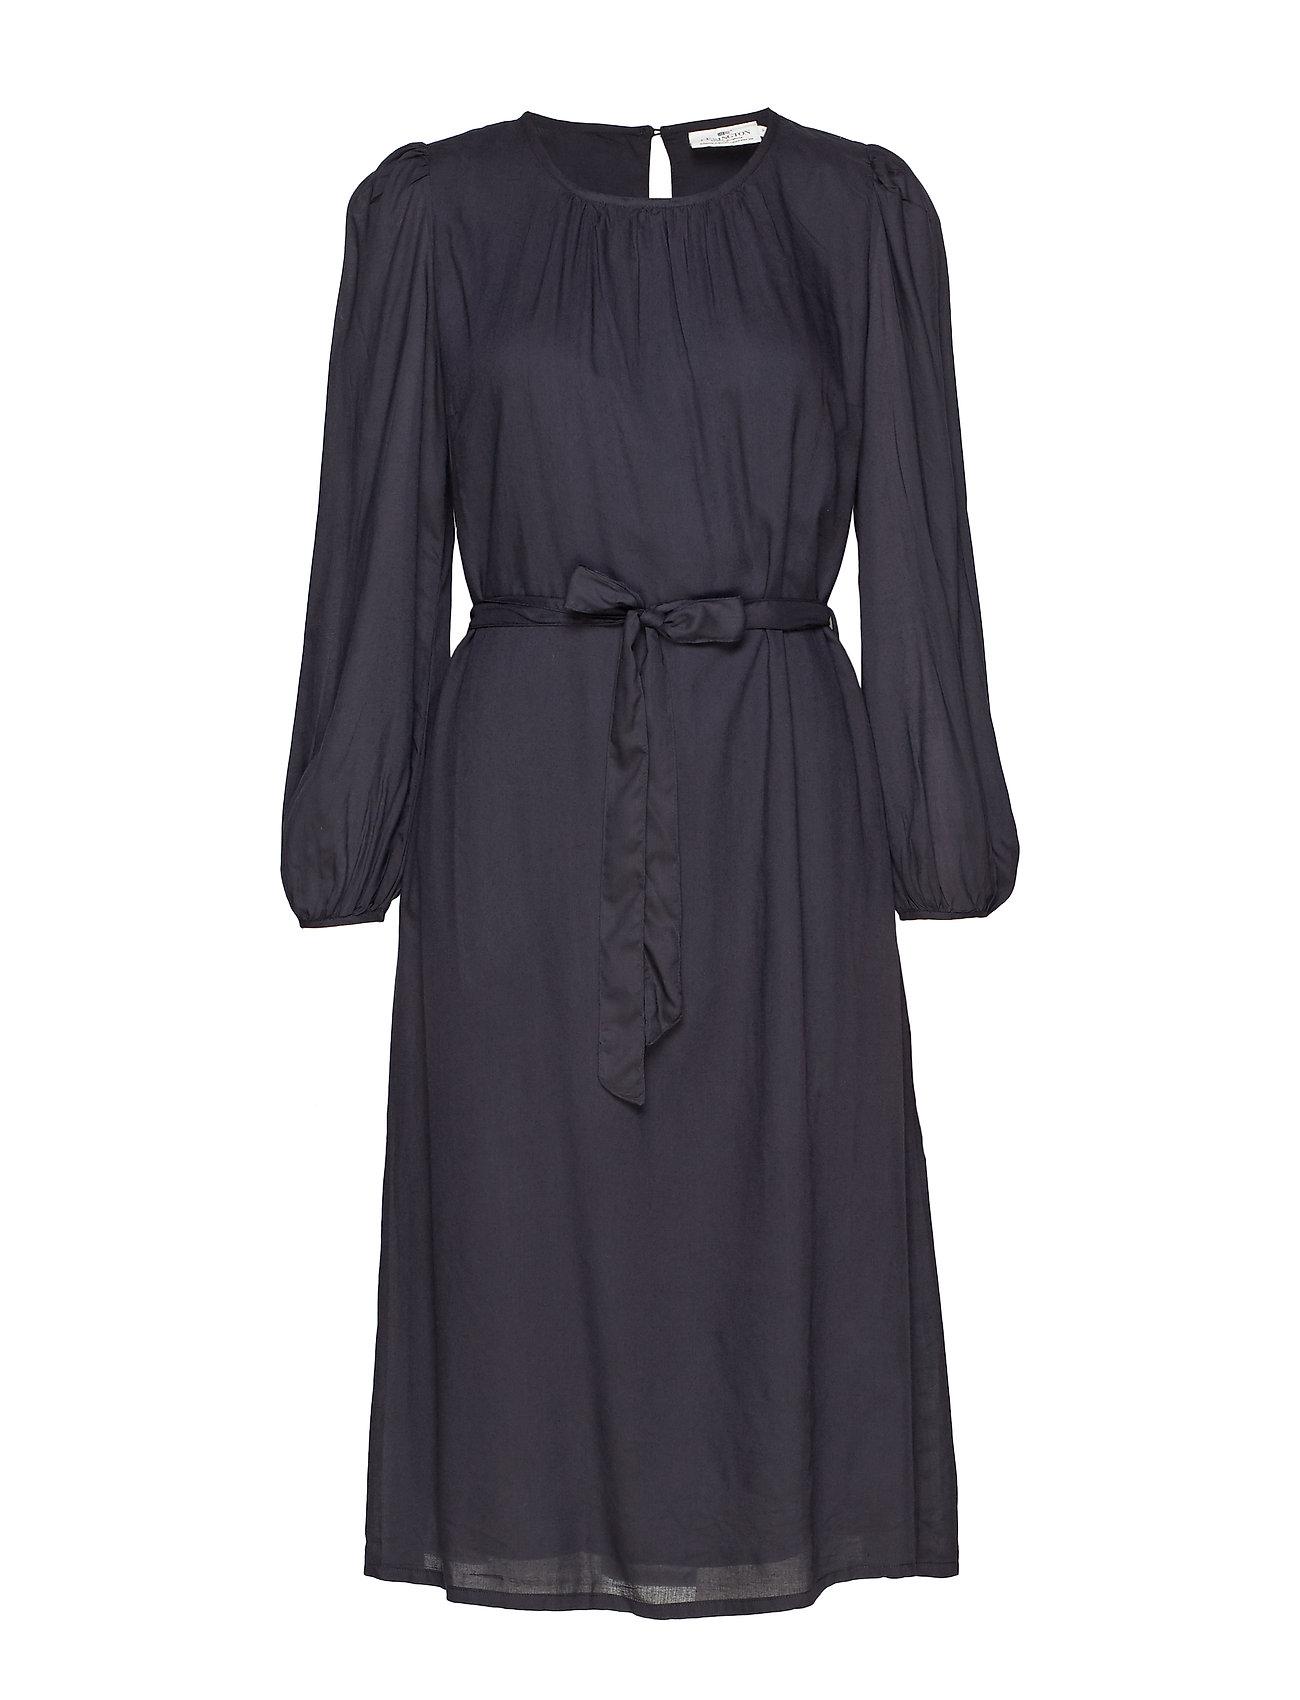 Lexington Clothing Mistie Dress - DARK BLUE